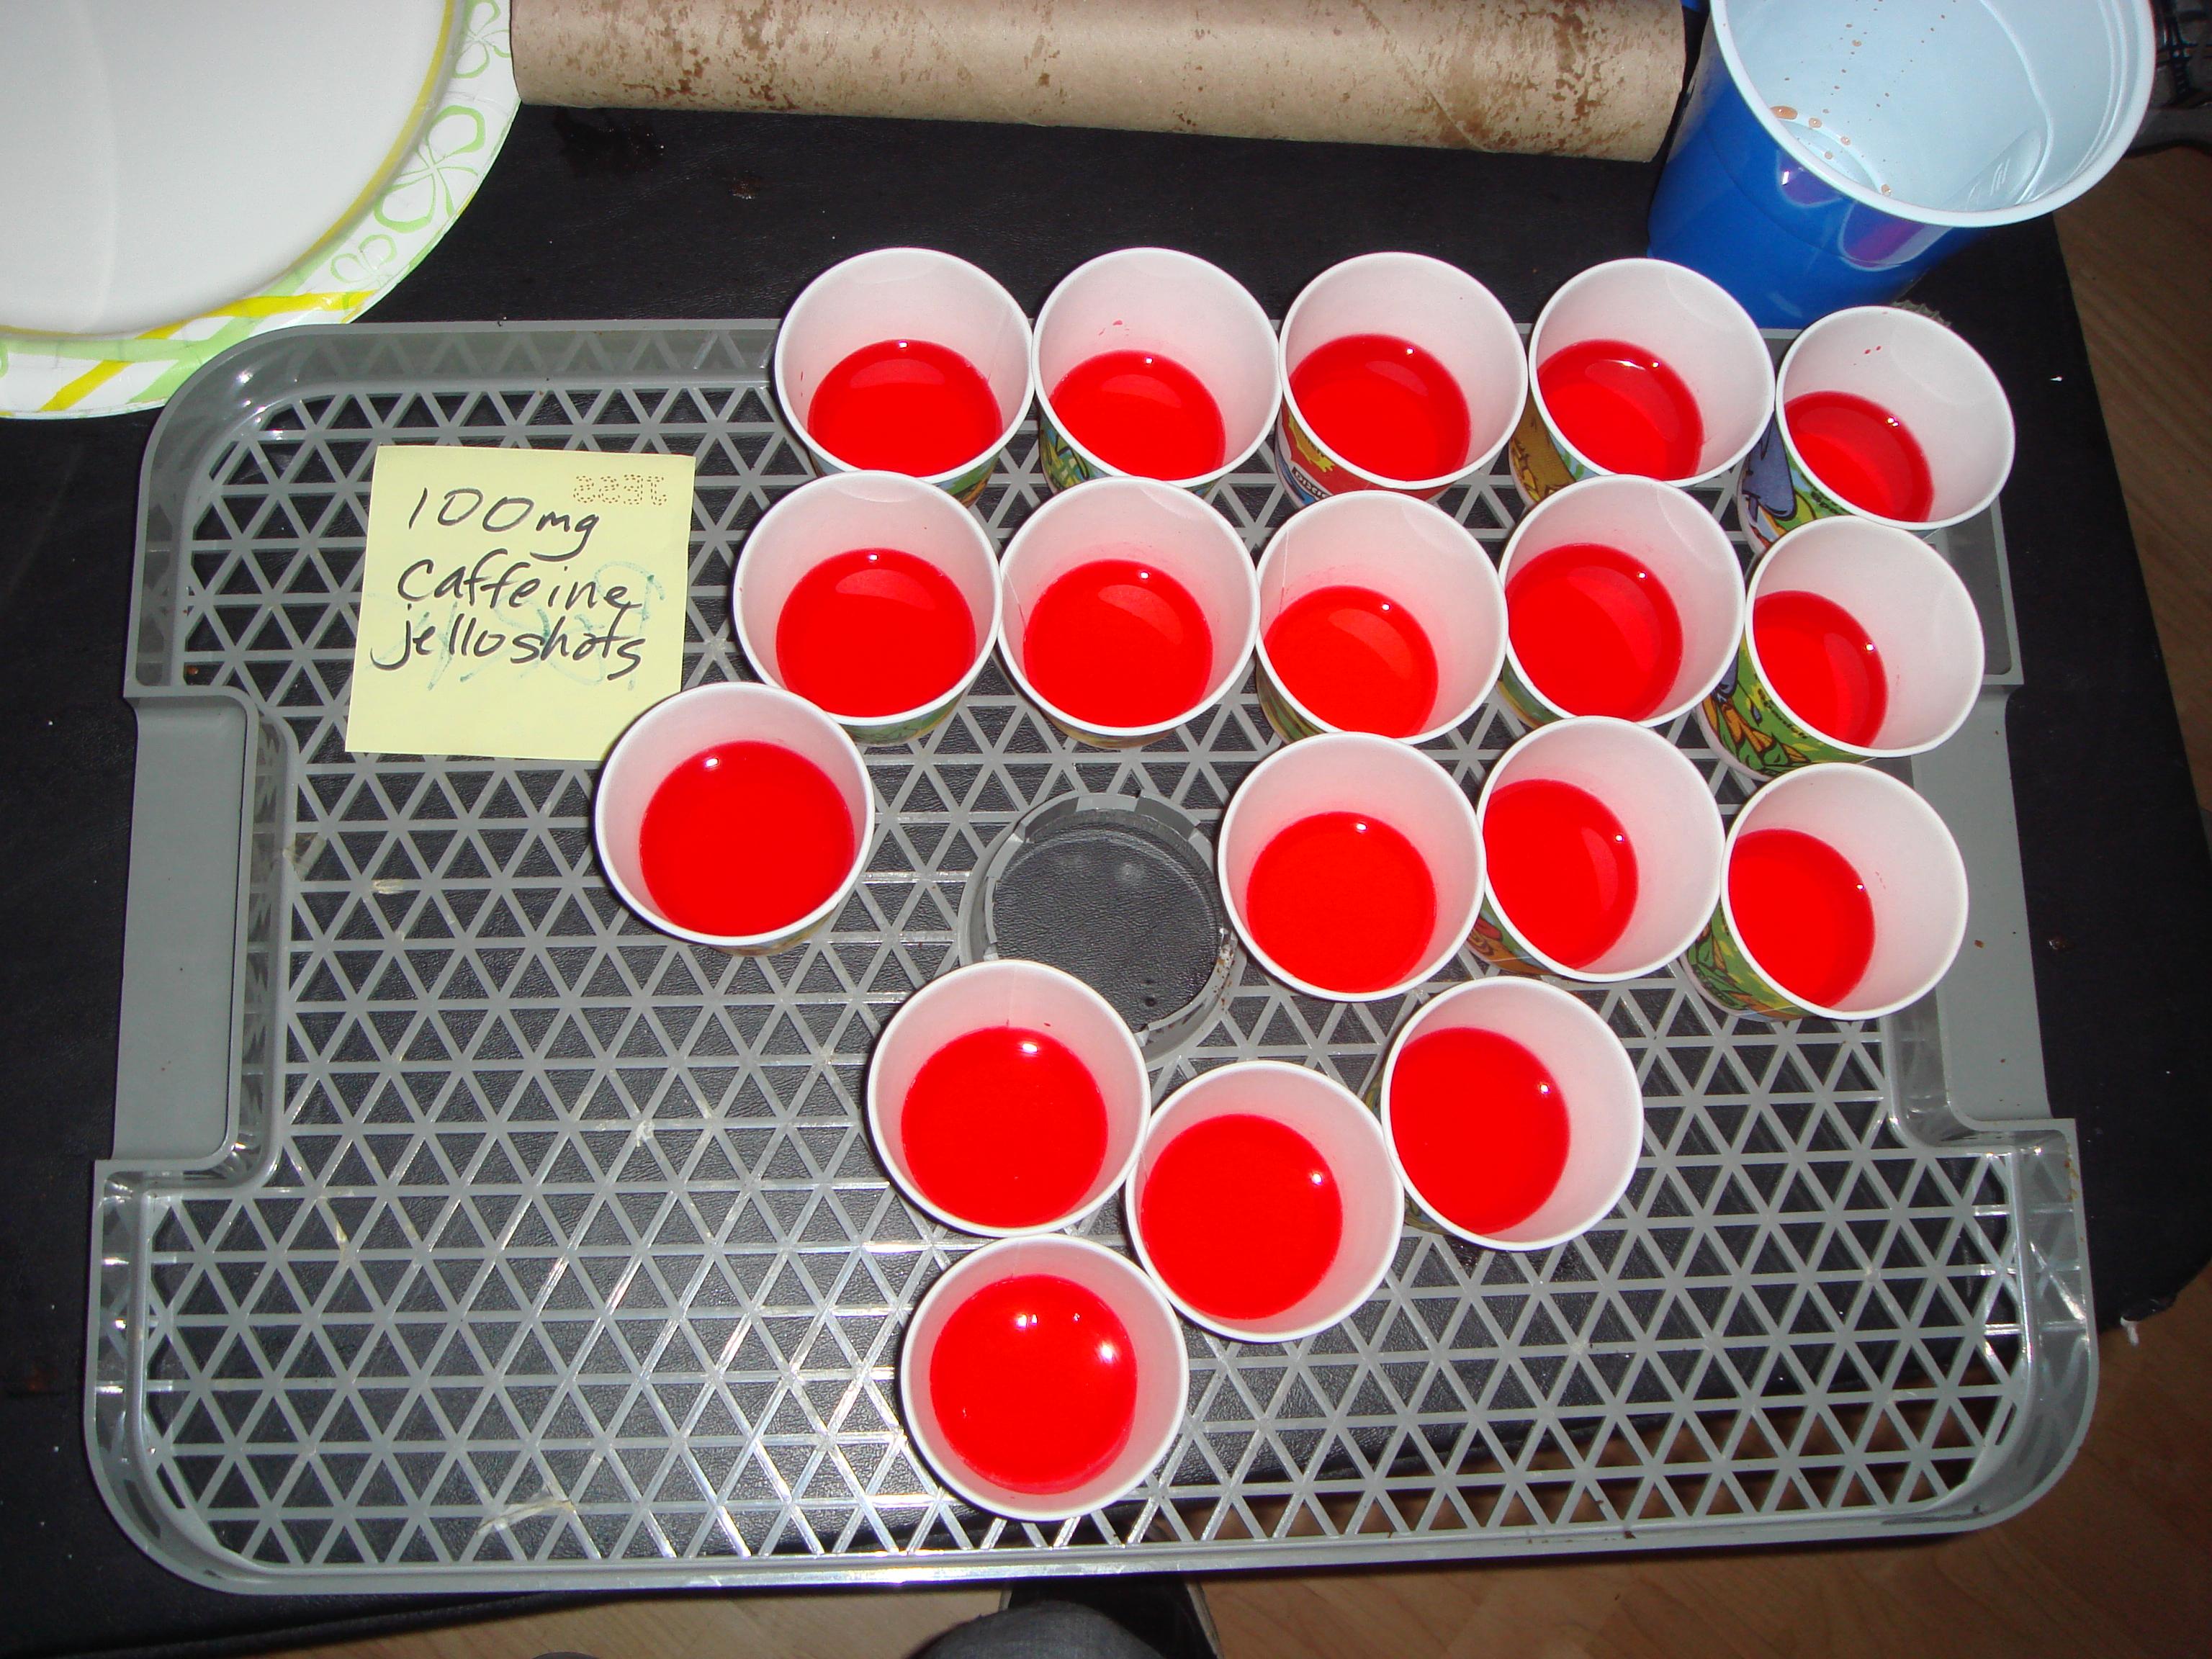 Caffeinated Jello Shots